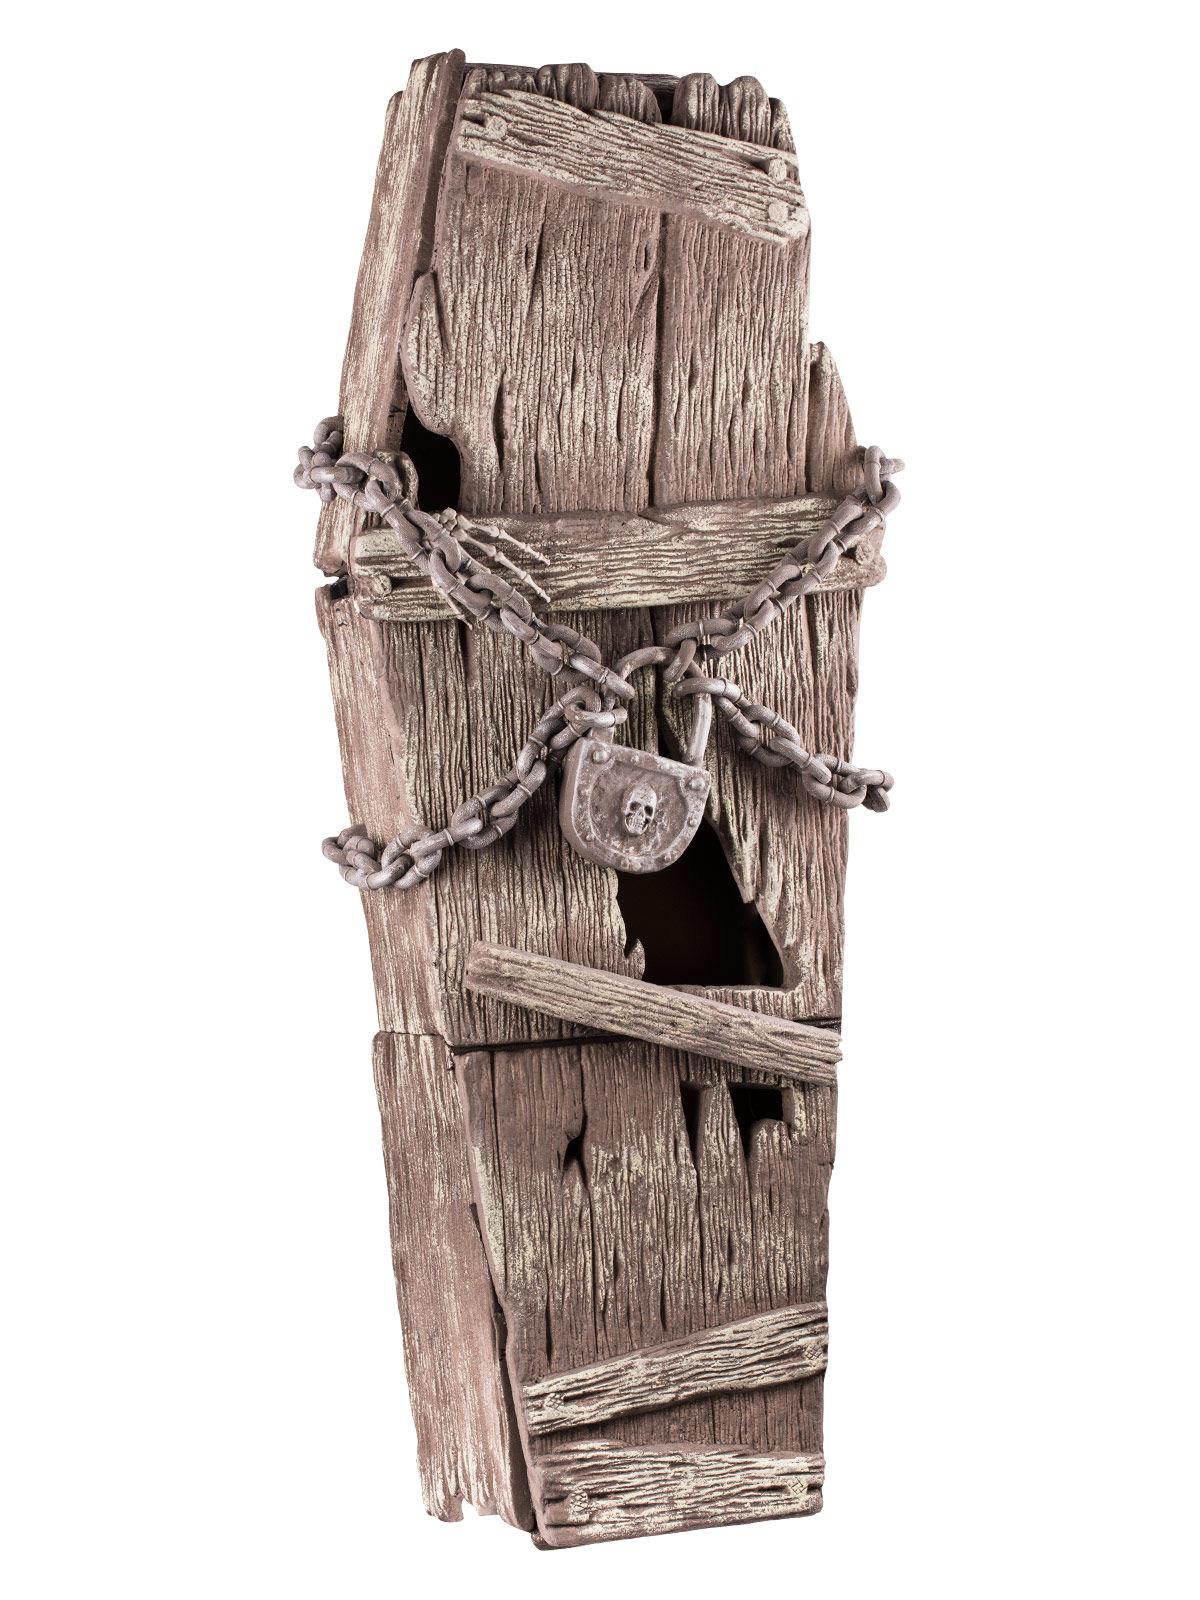 sarg deckel mit ketten halloween party deko braun 39x150cm g nstige faschings partydeko. Black Bedroom Furniture Sets. Home Design Ideas